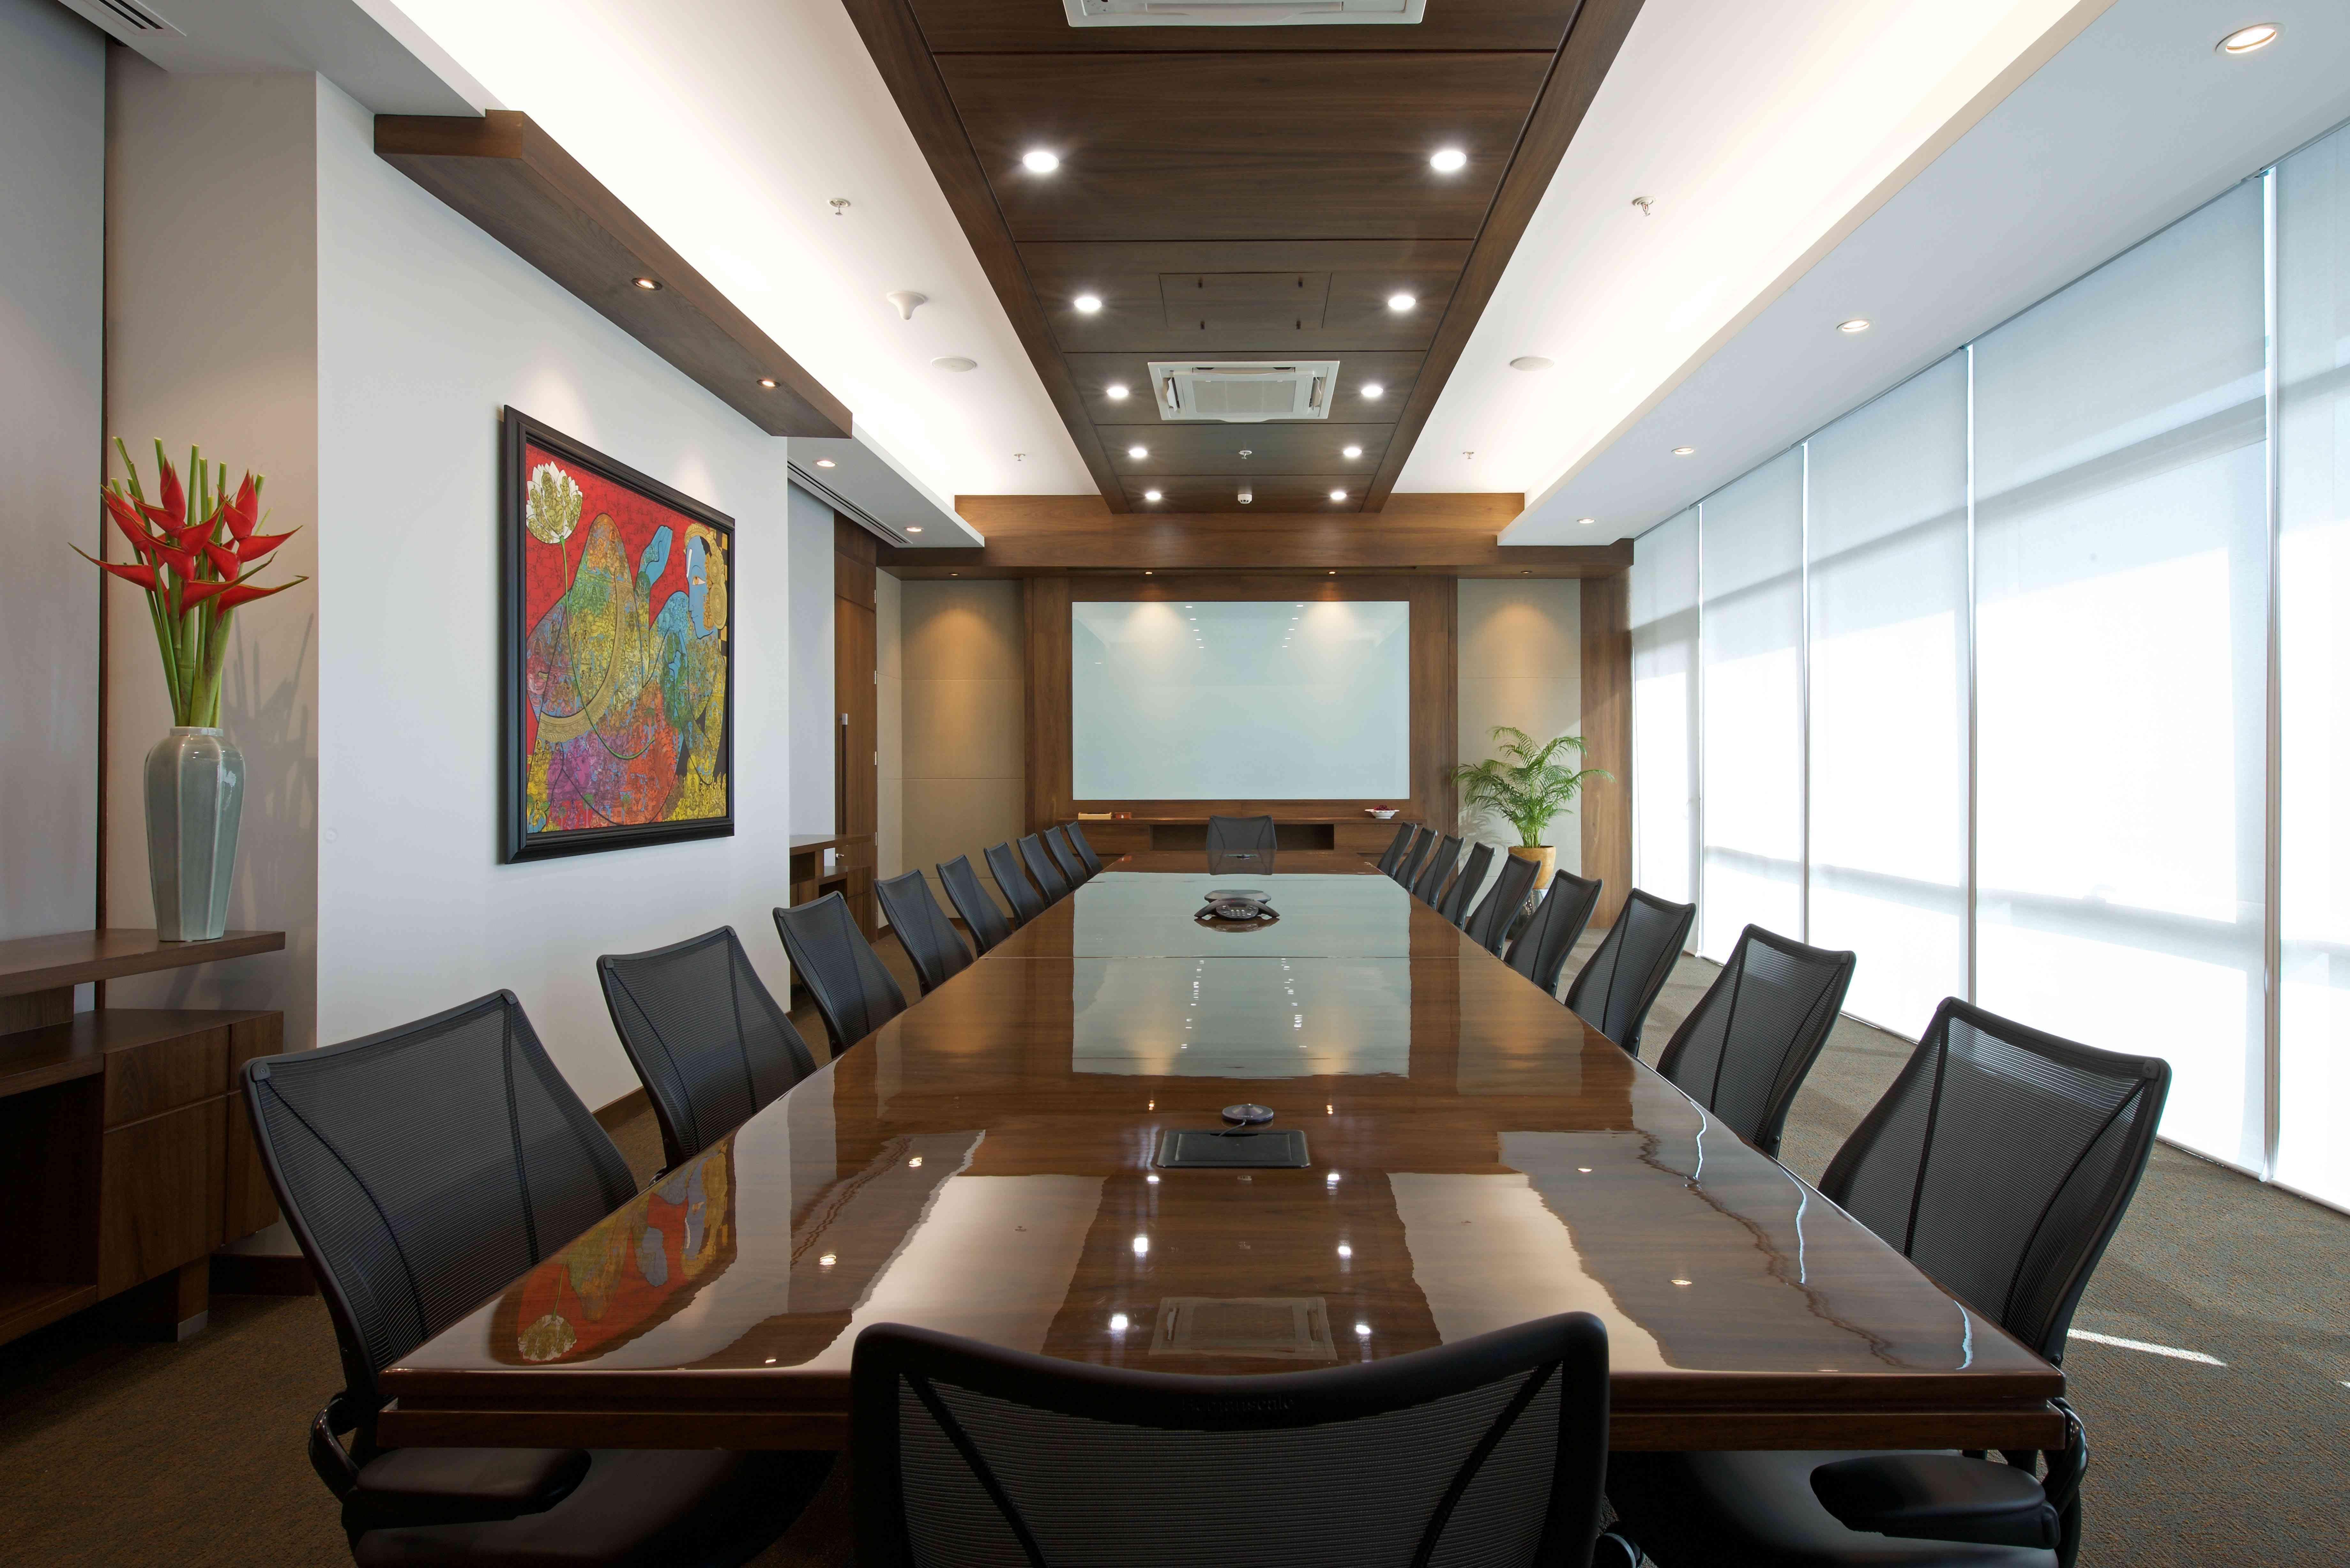 Ceiling Design For Office Md Cabin Ceiling Design For Office